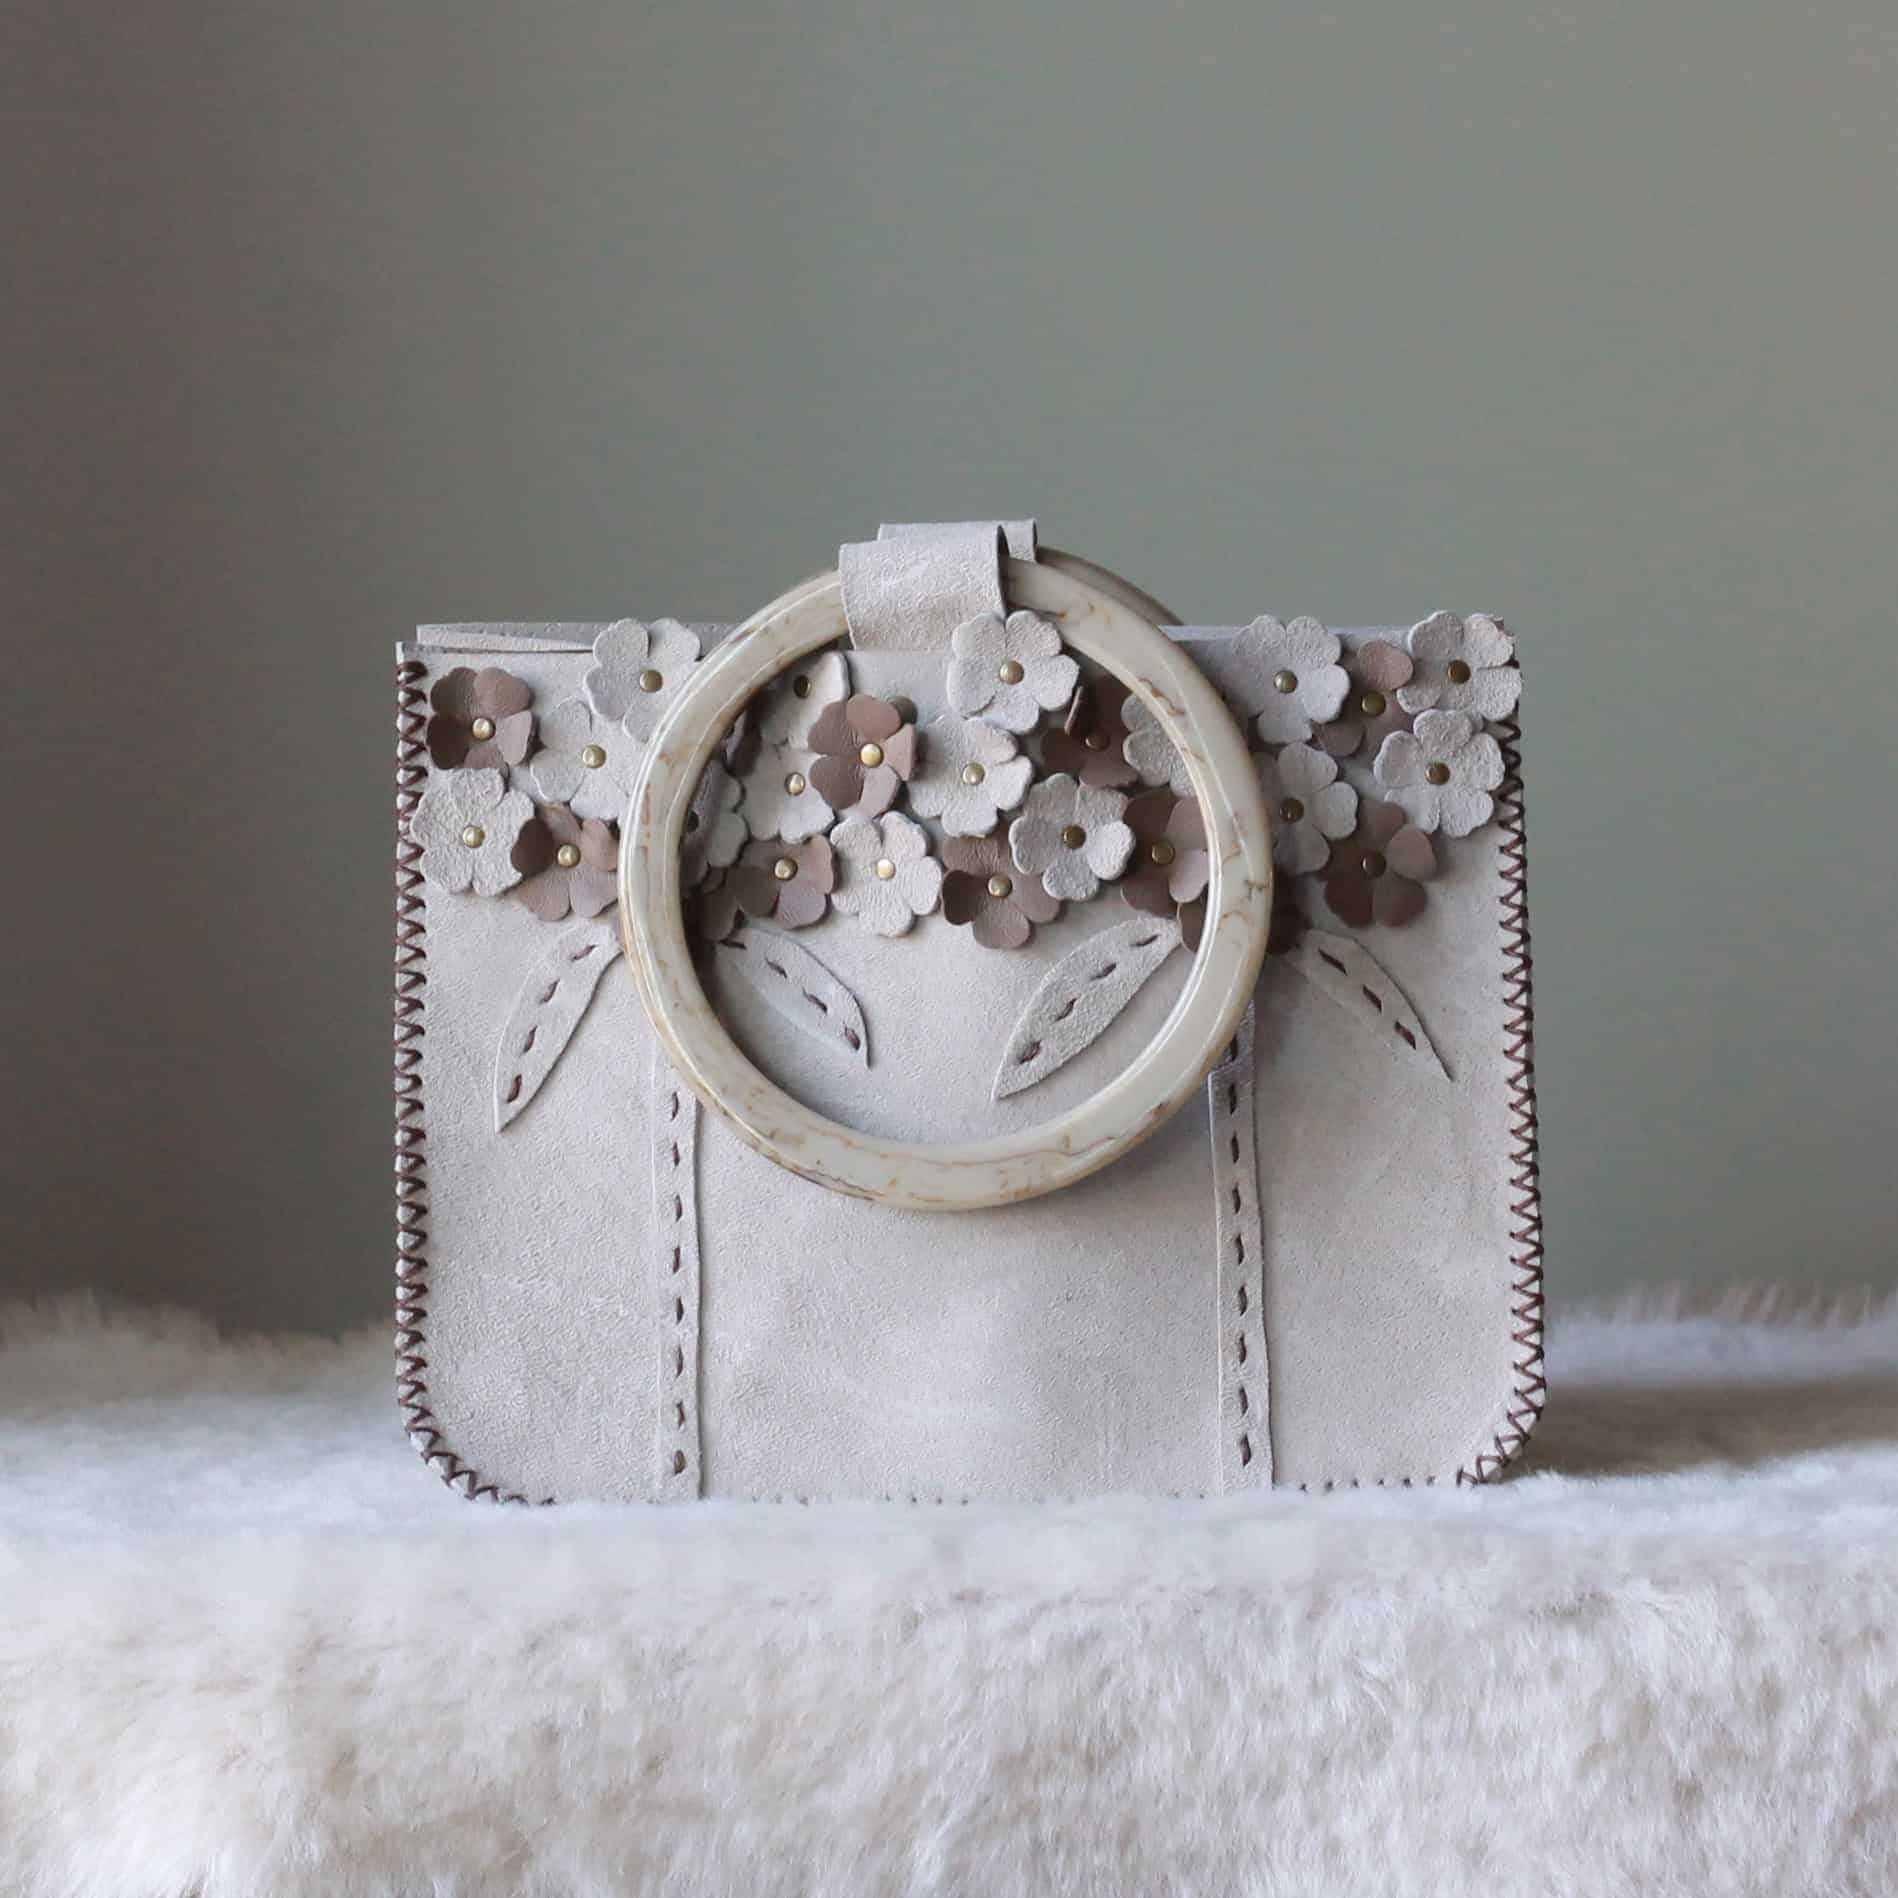 Handbag - Product